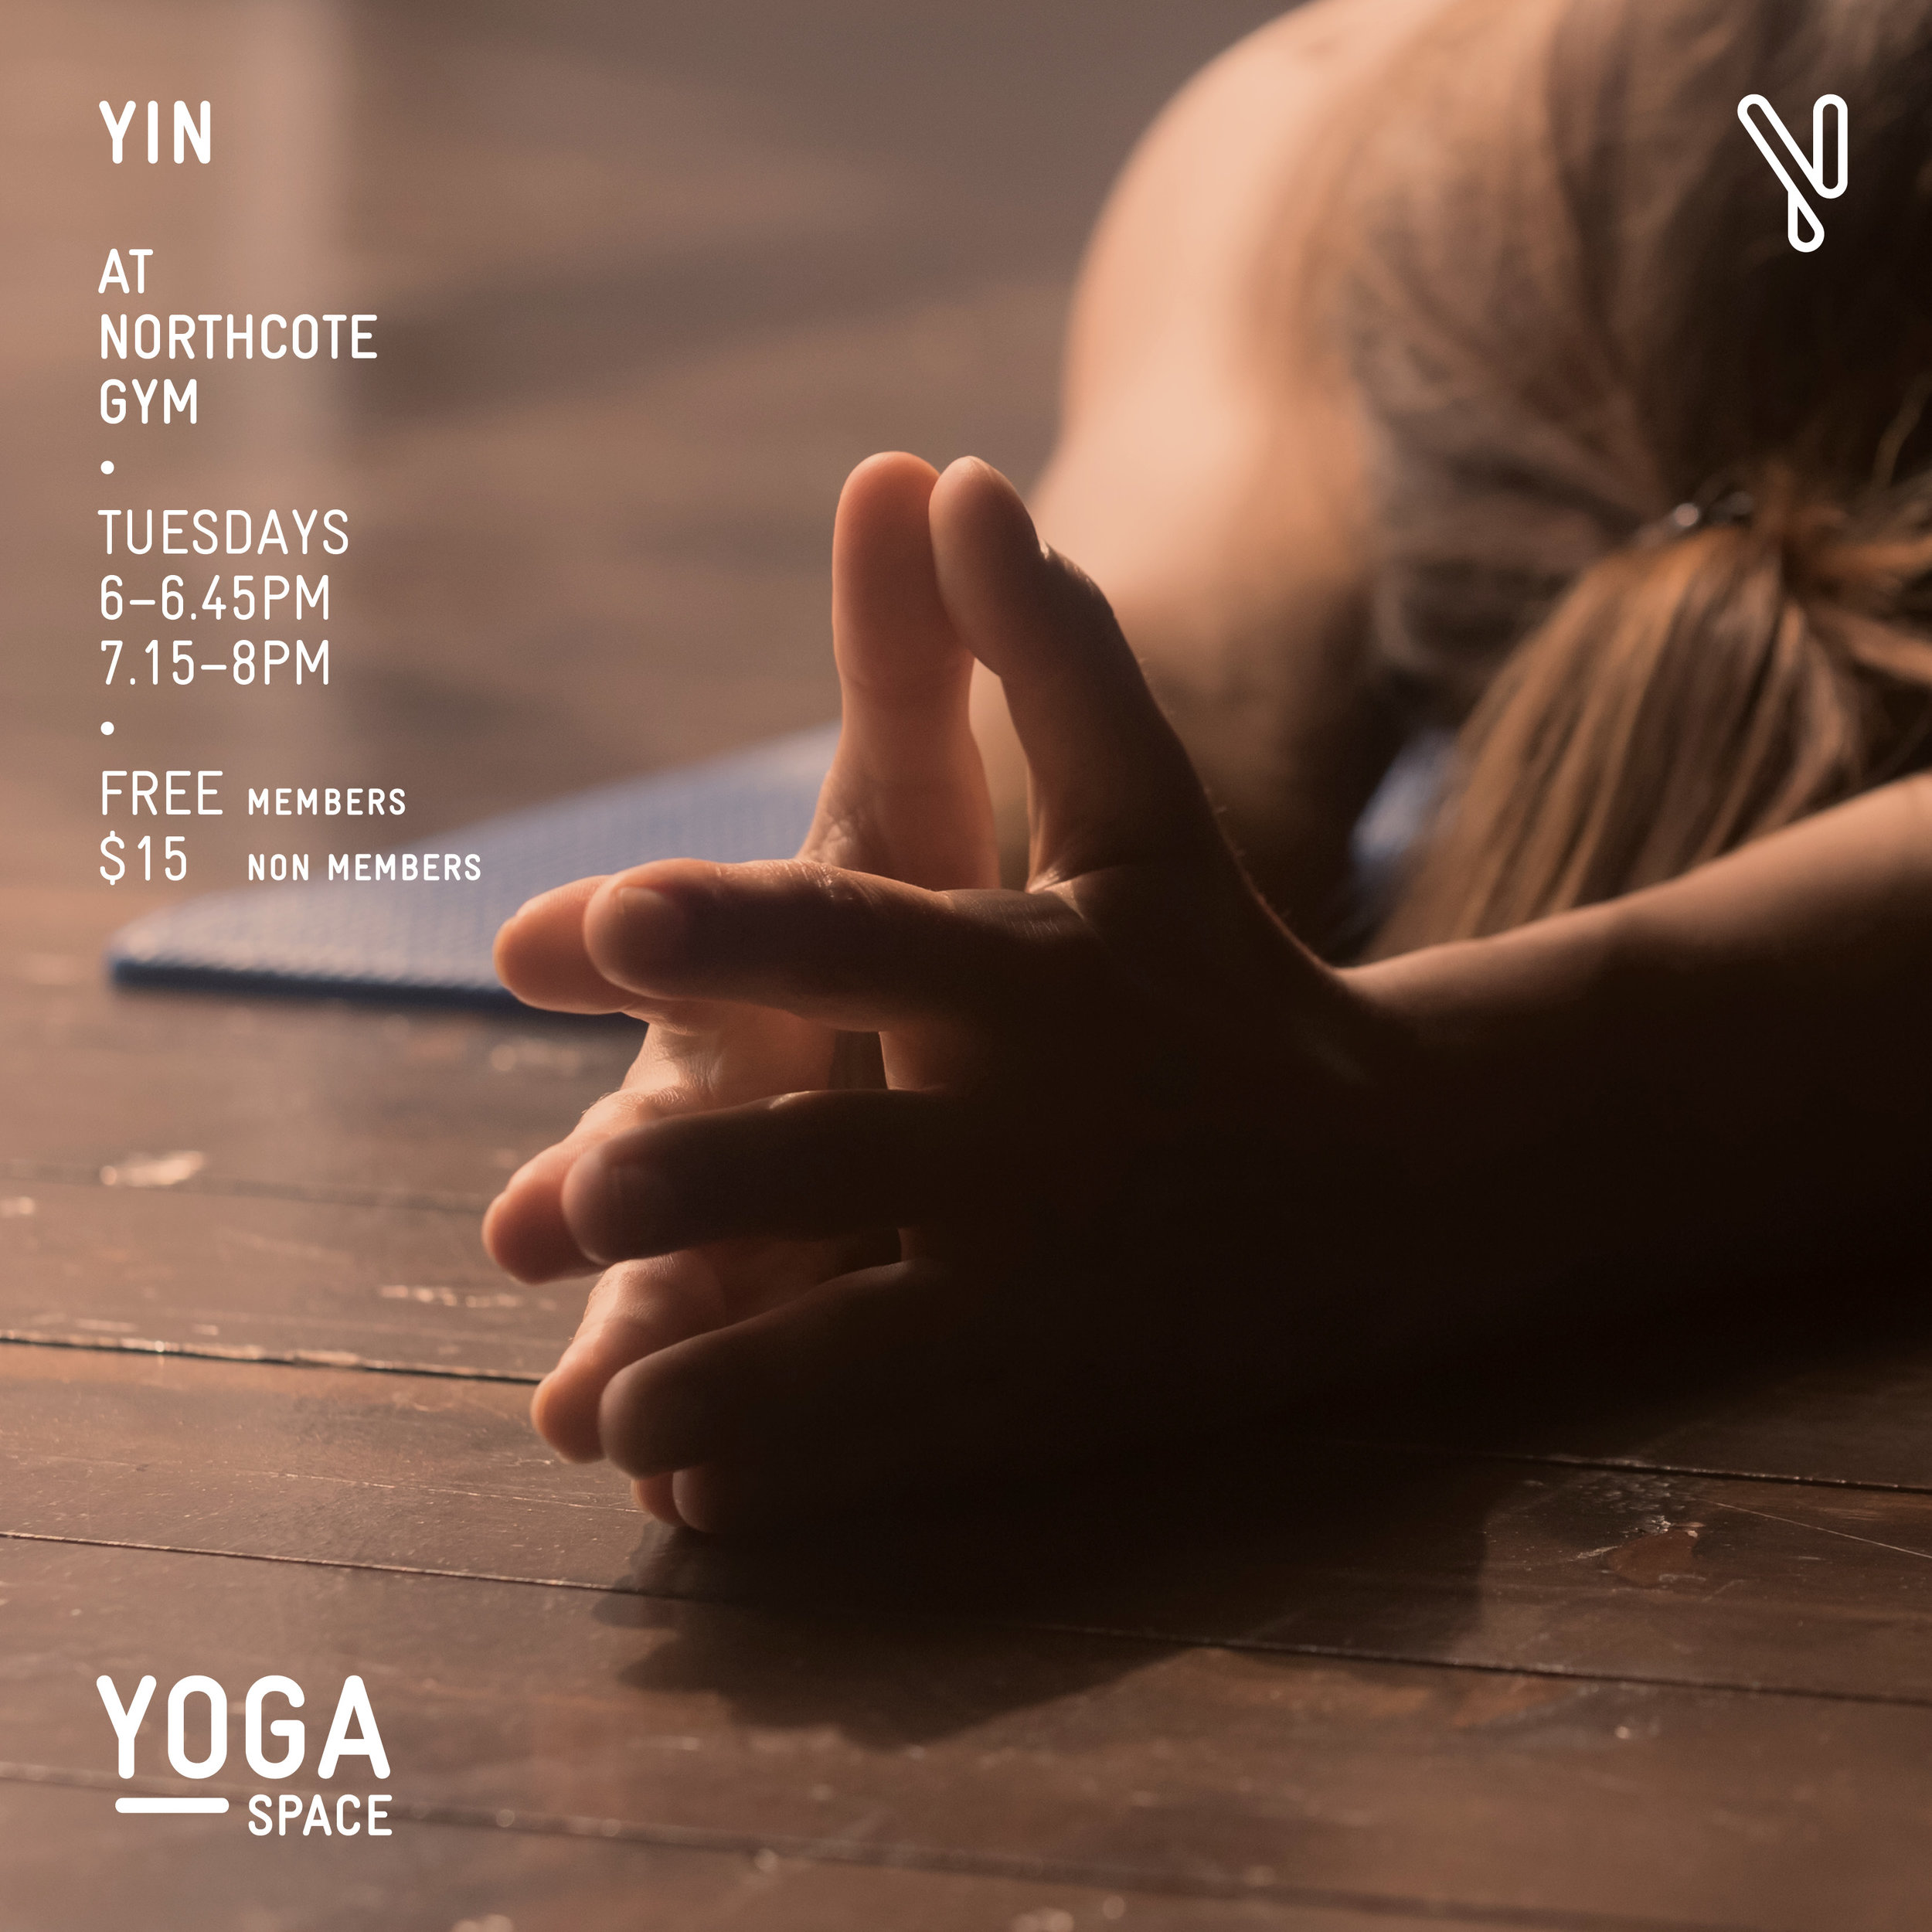 YogaAtNSPostTemplateSept19 d12.jpg